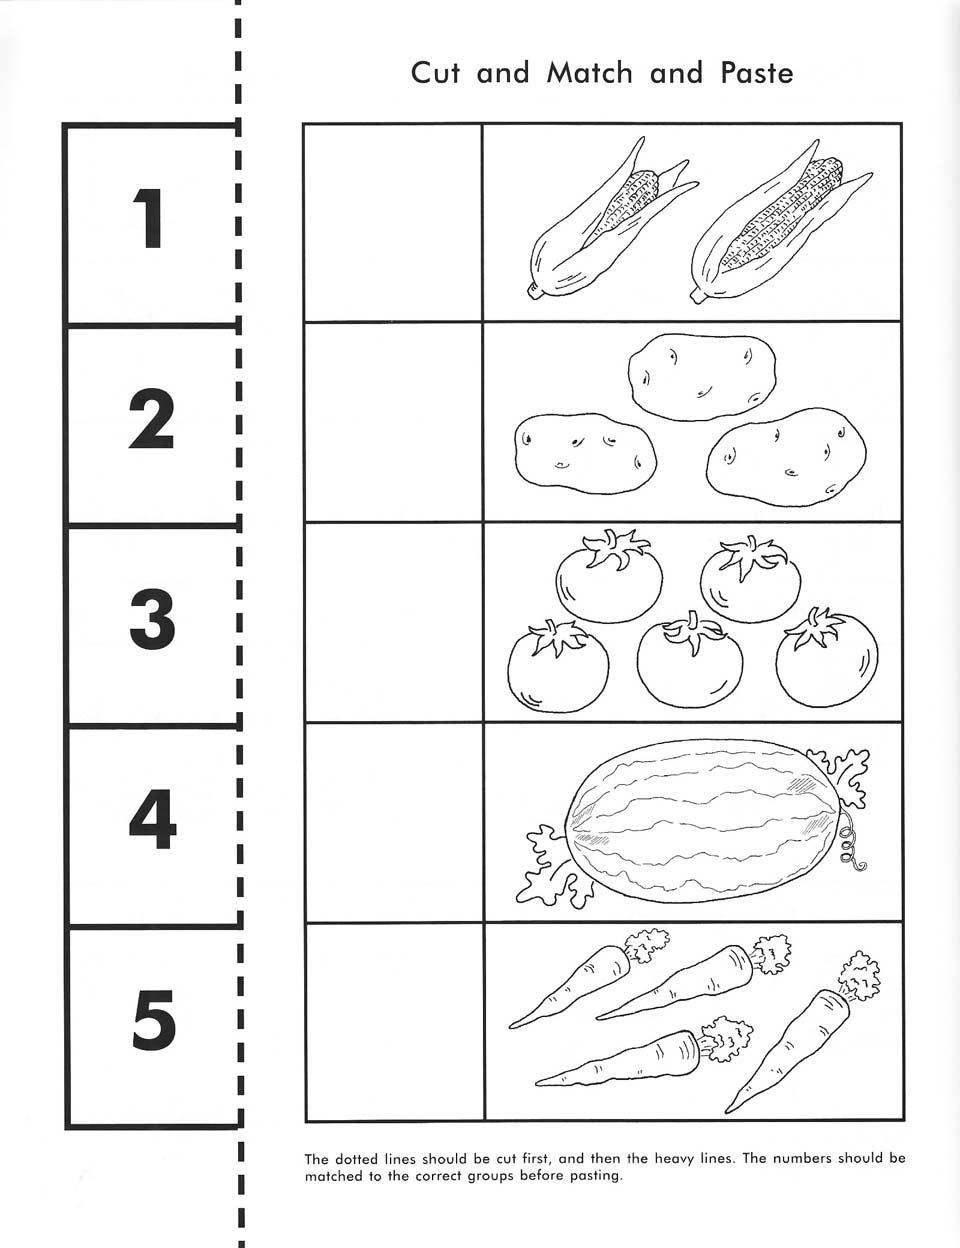 Cut And Paste Worksheets For Kindergarten Free